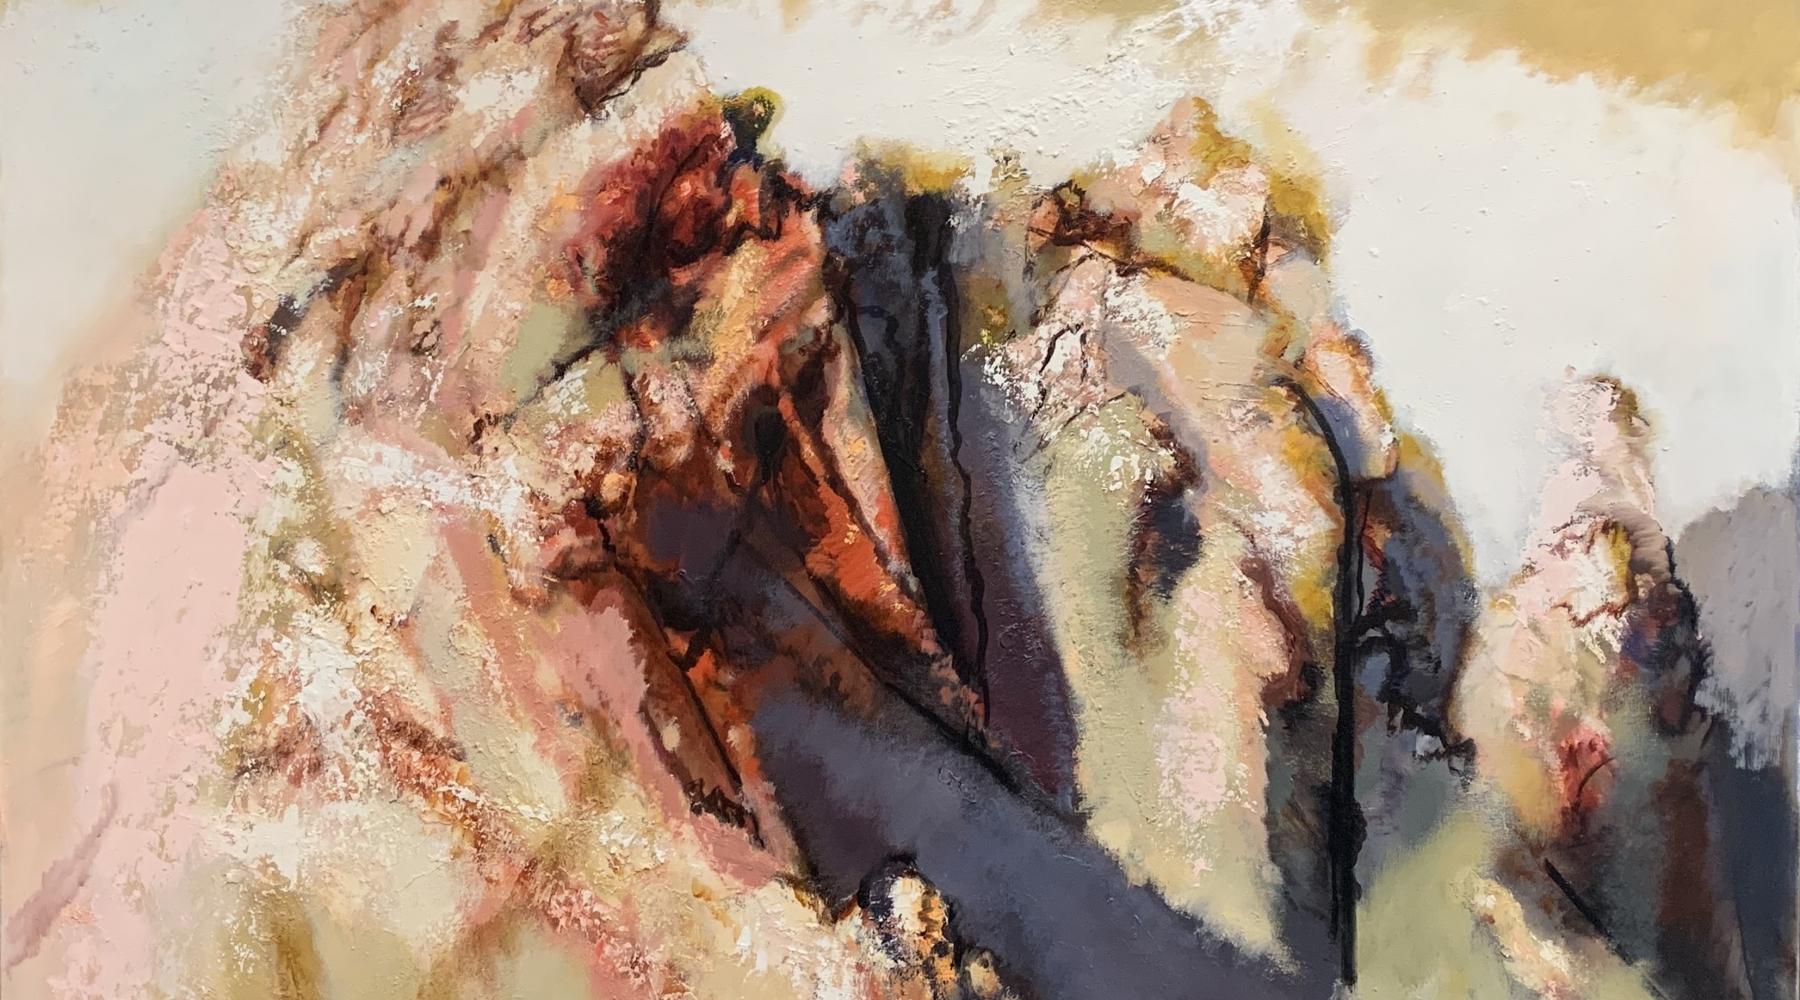 Doug Snow, utah artist, abstract, landscape, David Dee Fine Arts